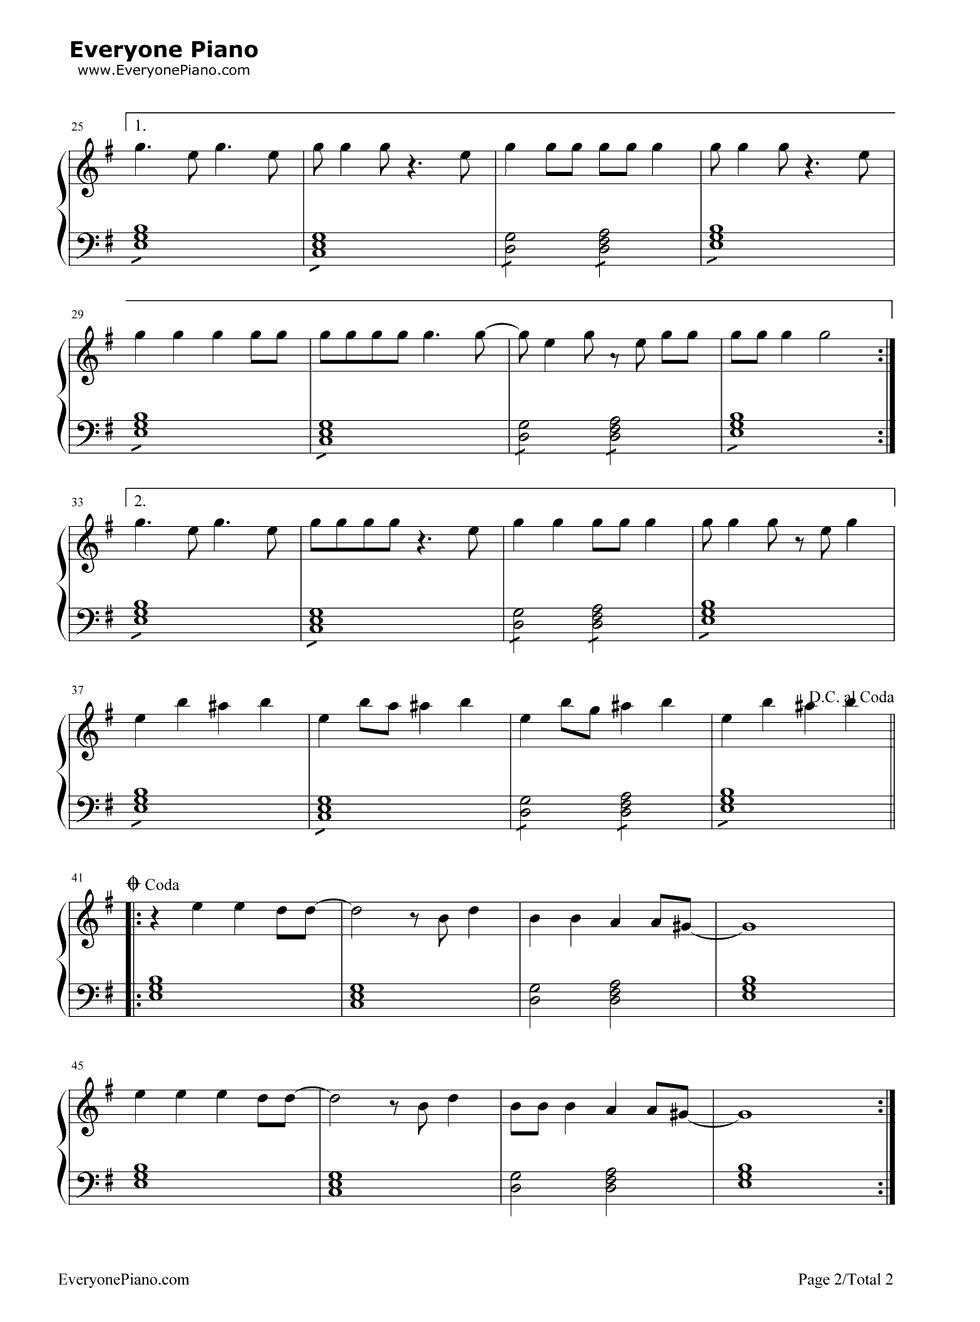 Uma Thurman-Fall Out Boy Stave Preview 2-Free Piano Sheet Music u0026 Piano Chords